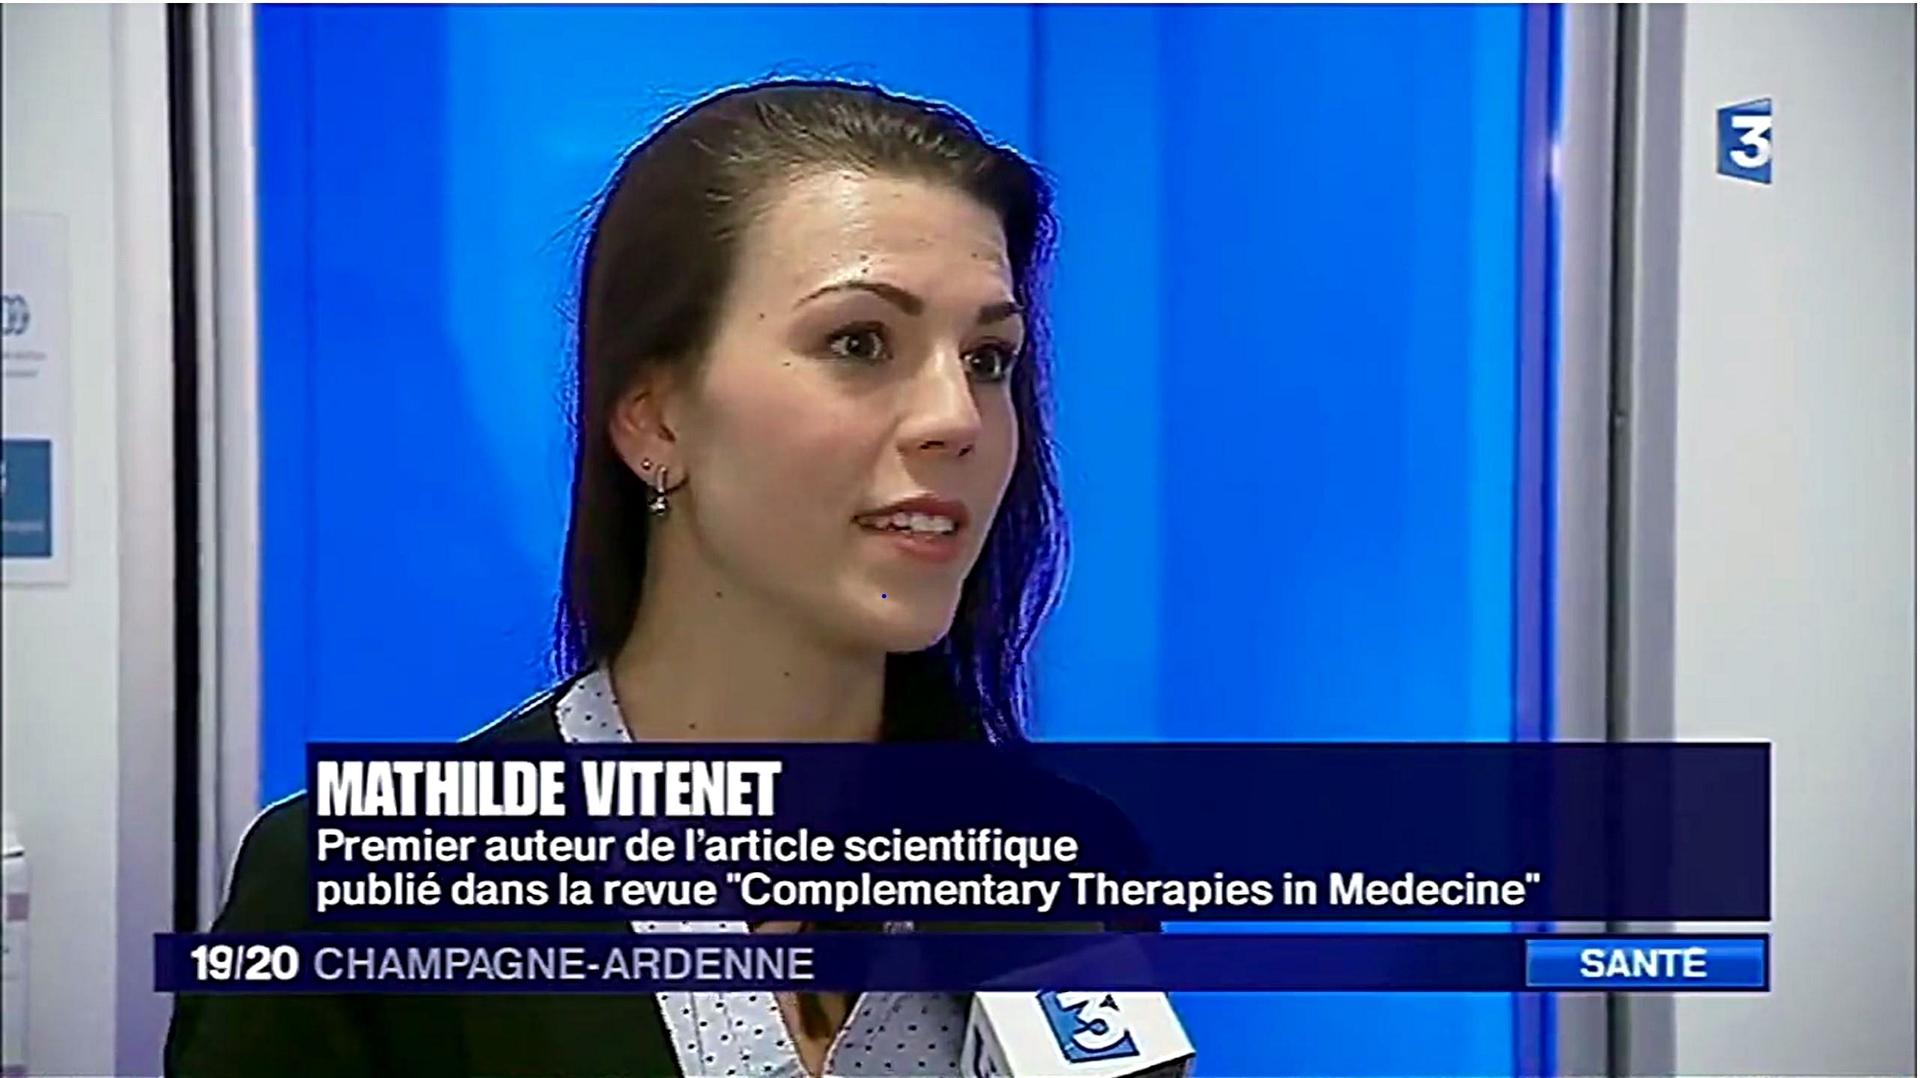 Mathilde Vitenet - Reportage de France 3